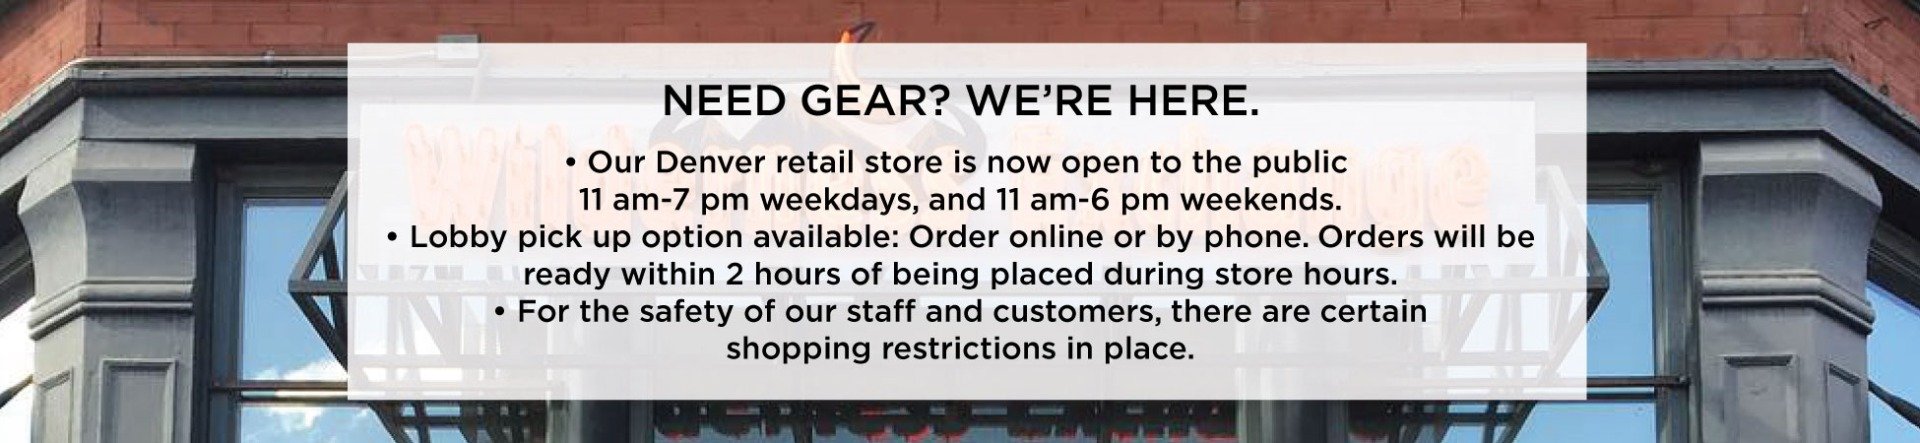 WildyX Retail Store is OPEN!